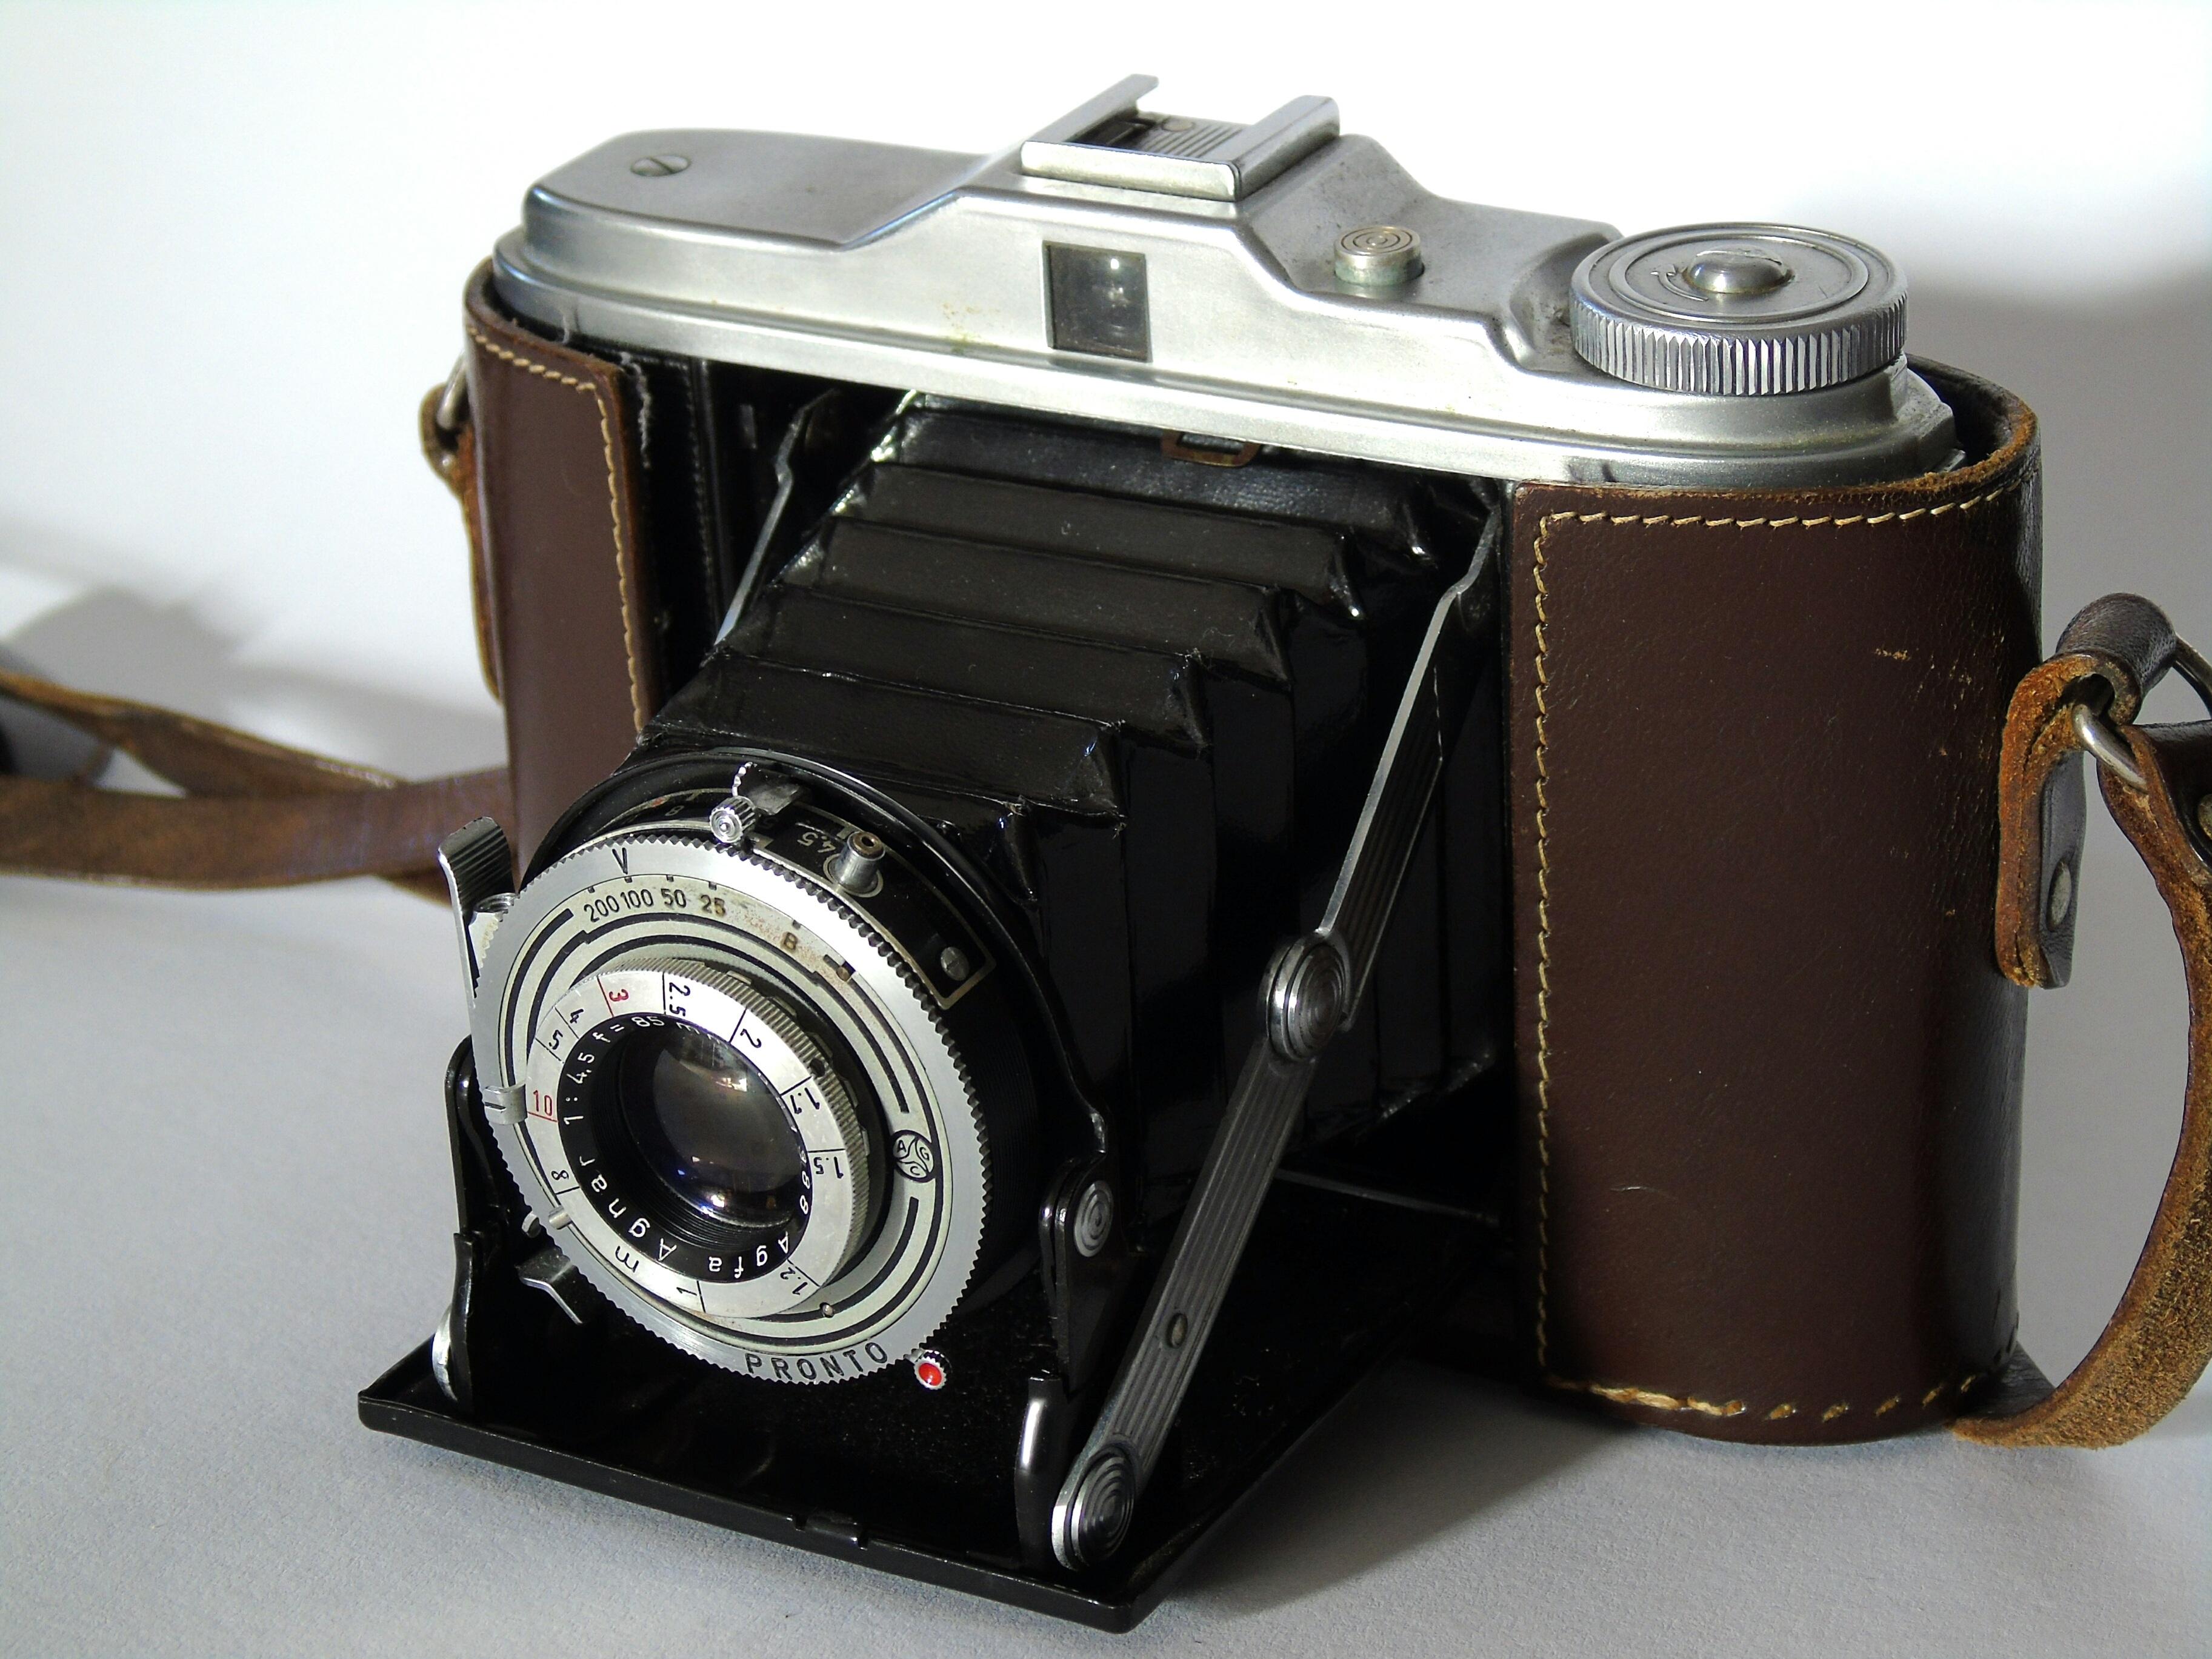 найти старый фотоаппарат во сне дорогостоящего